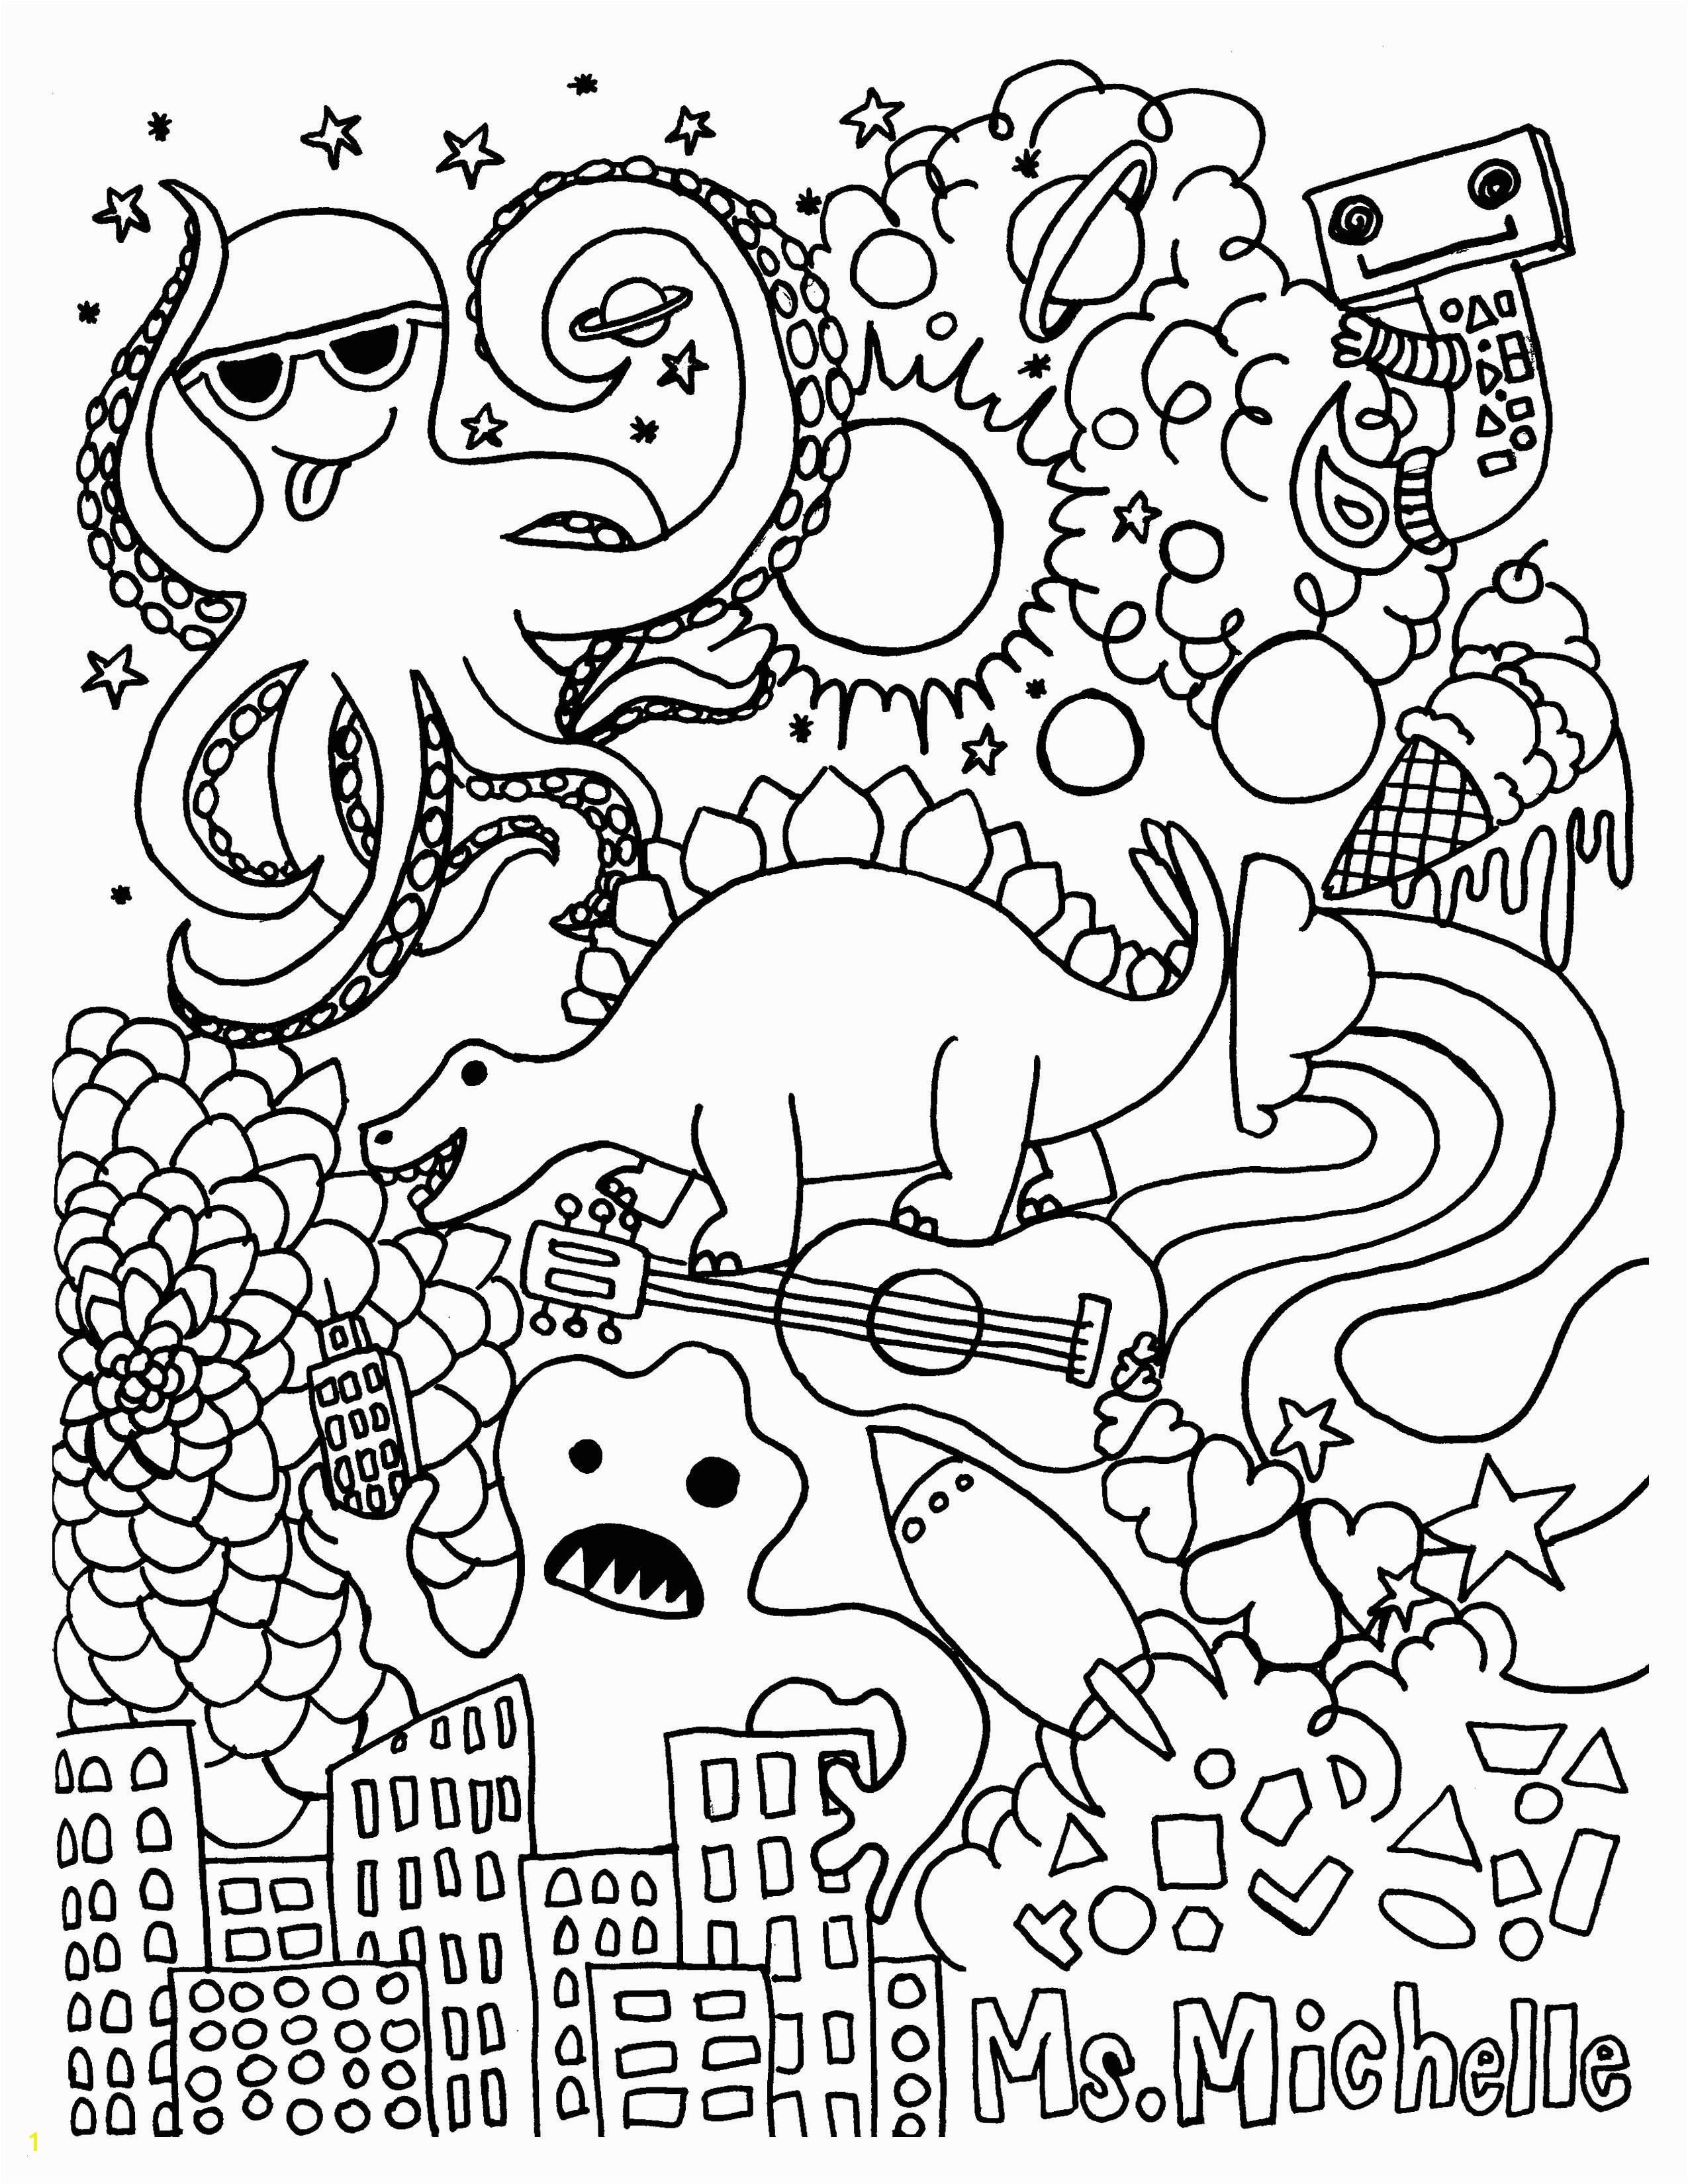 Freddy Krueger Coloring Pages Freddy Krueger Coloring Page Inspirational Coloring Pages to Print F